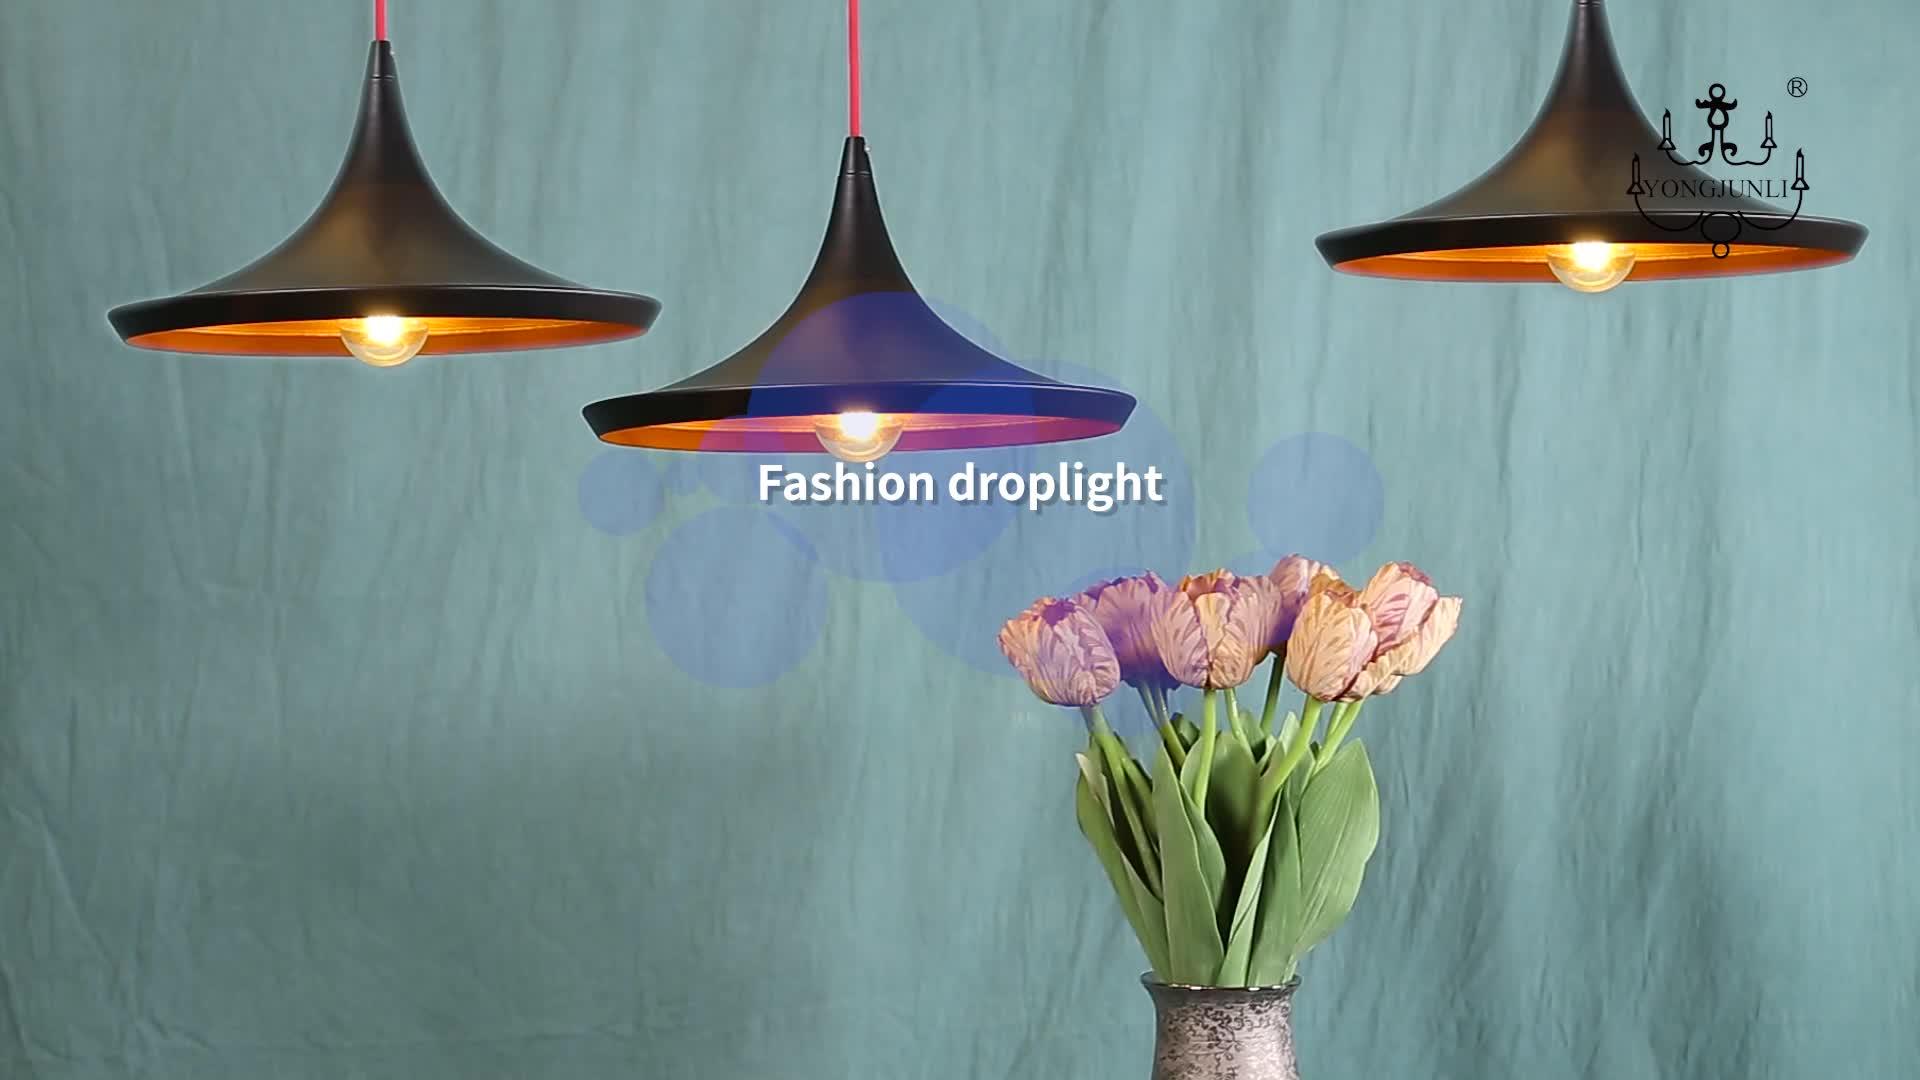 Eetkamer smeedijzeren aluminium zwarte kroonluchters e27 modern design keuken led hanglamp